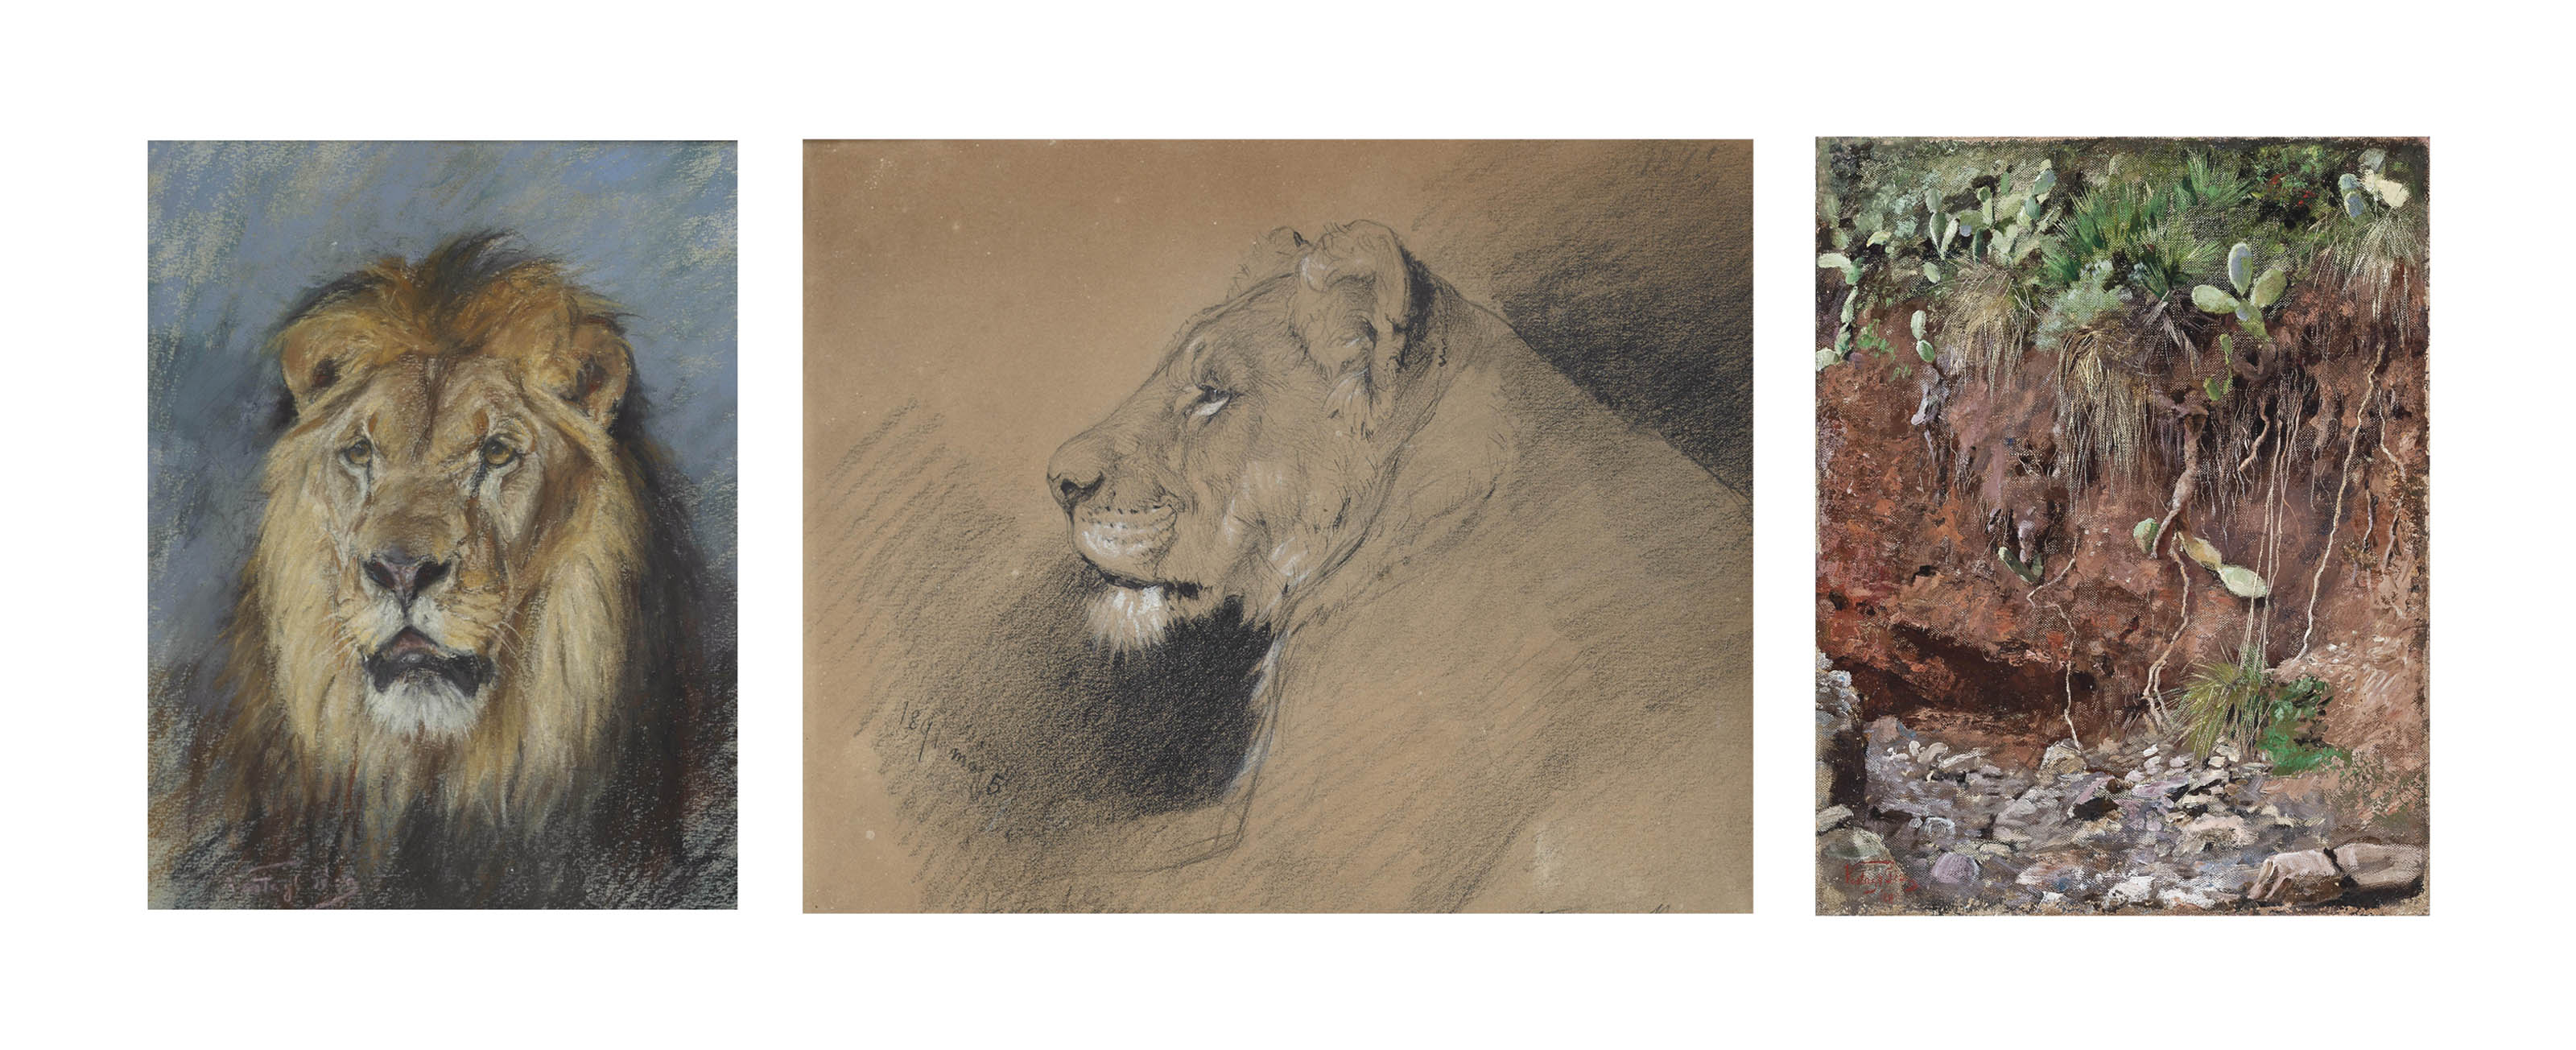 Geza Vastagh (HUNGARIAN, 1866-1919) , A Lion Study